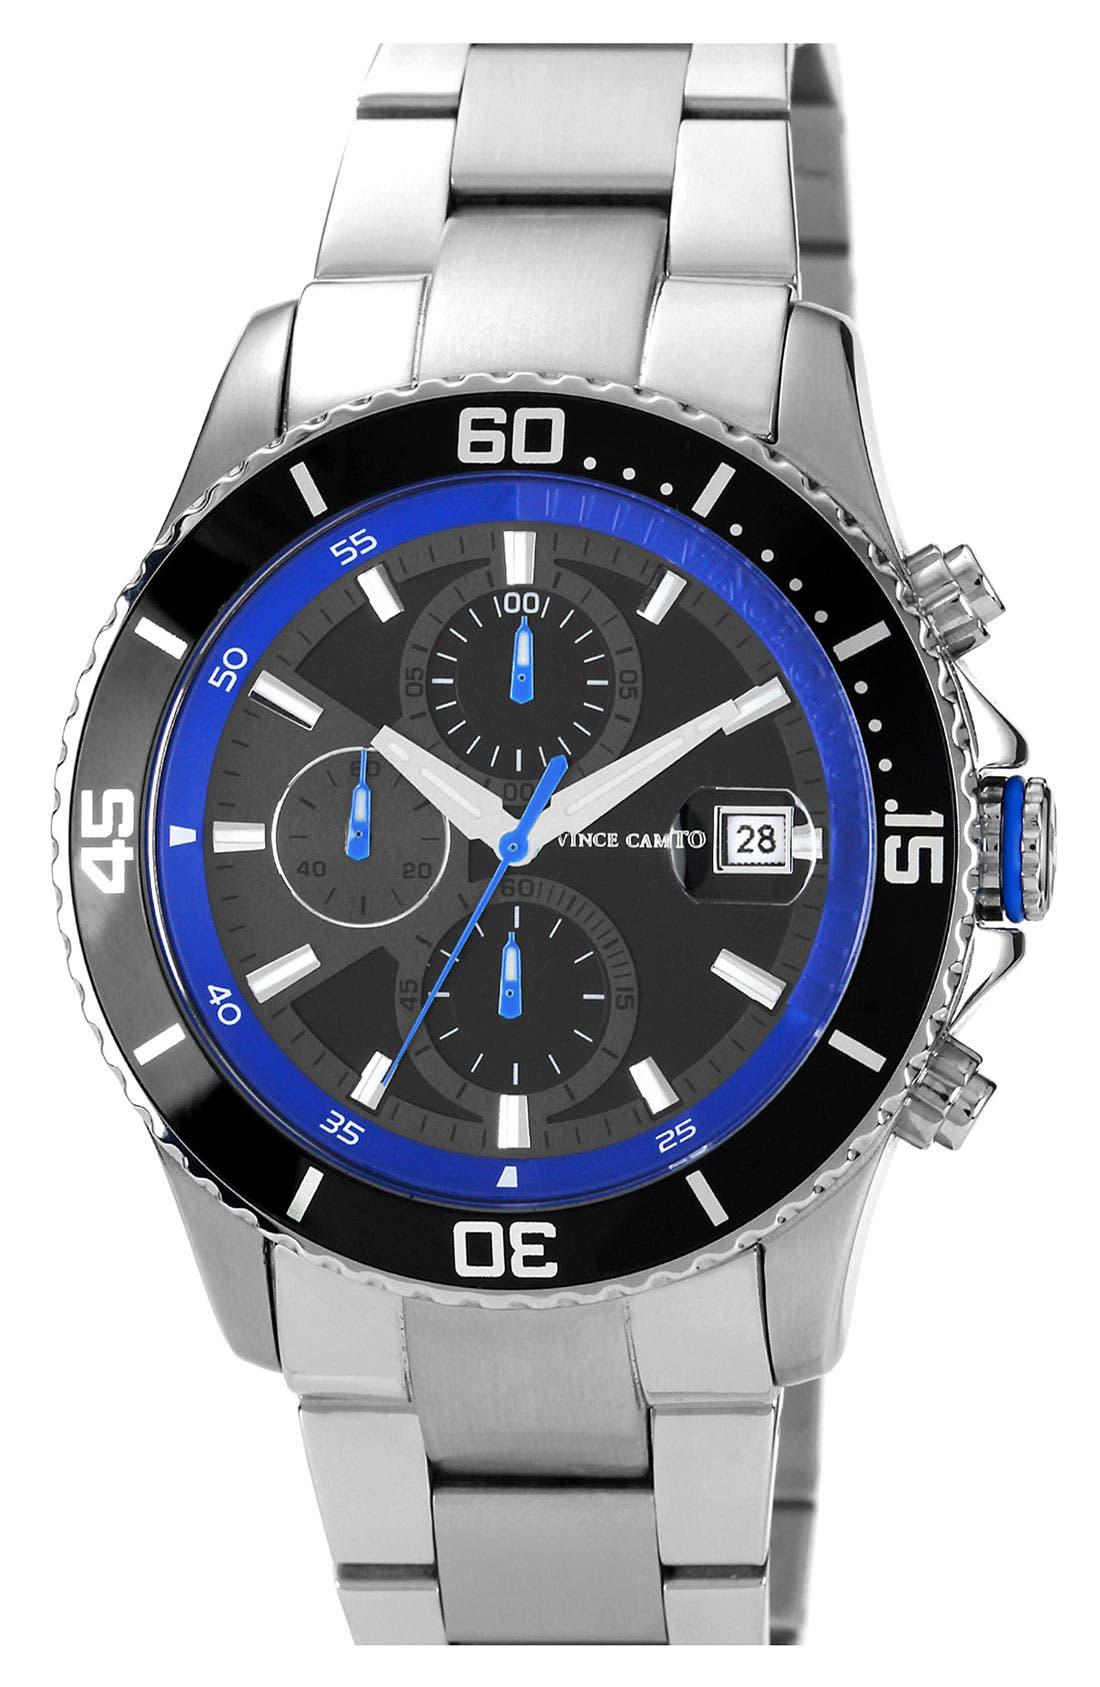 Alternate Image 1 Selected - Vince Camuto 'Cavalier' Chronograph Bracelet Watch, 45mm